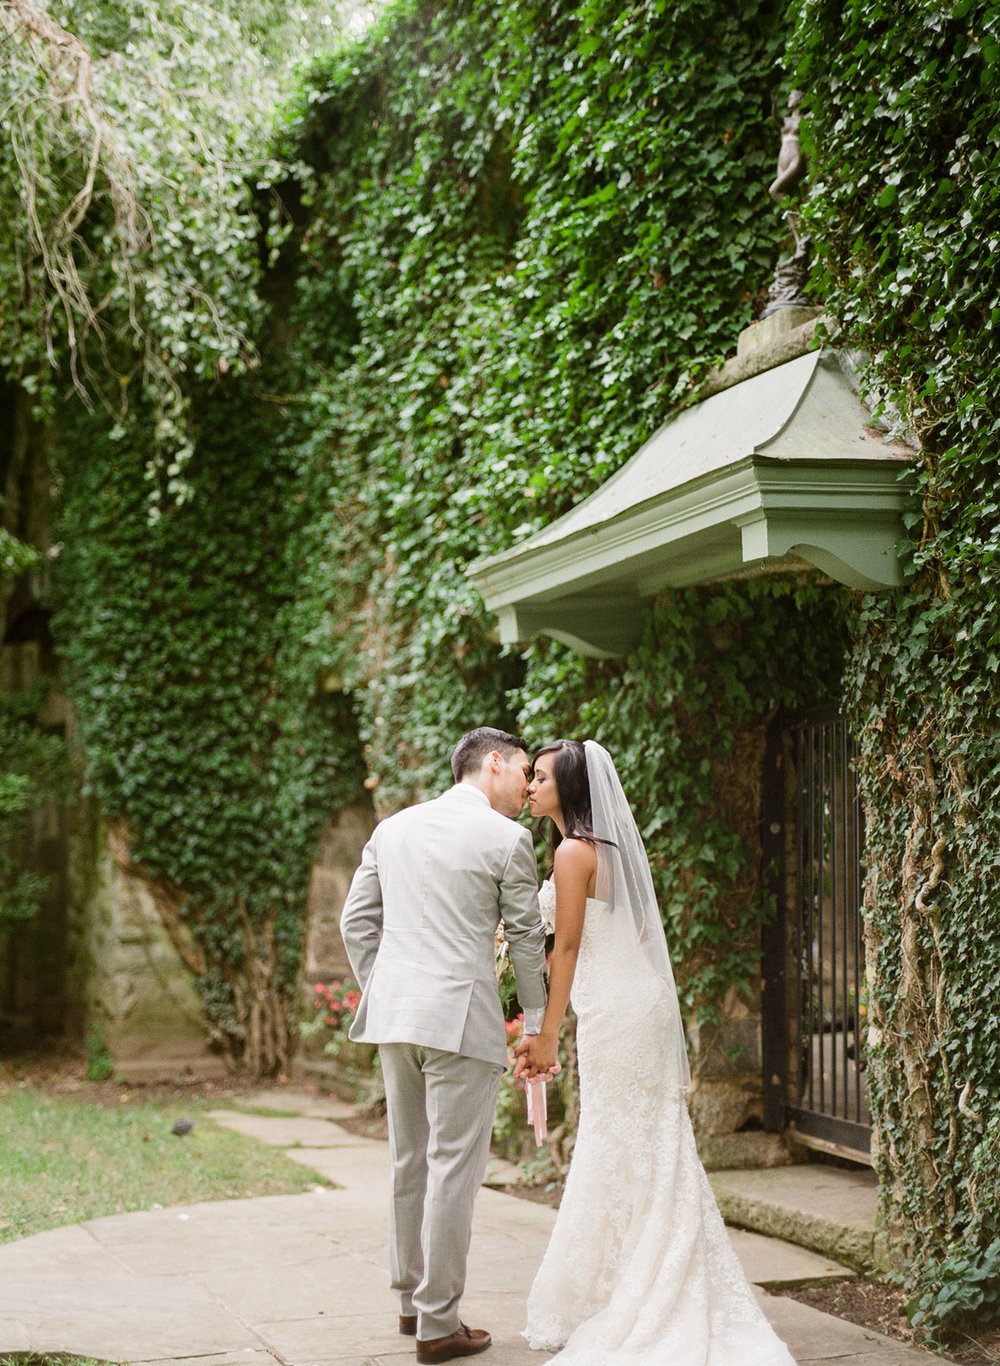 Virginia-Film-Photographer-Wedding-02.jpg